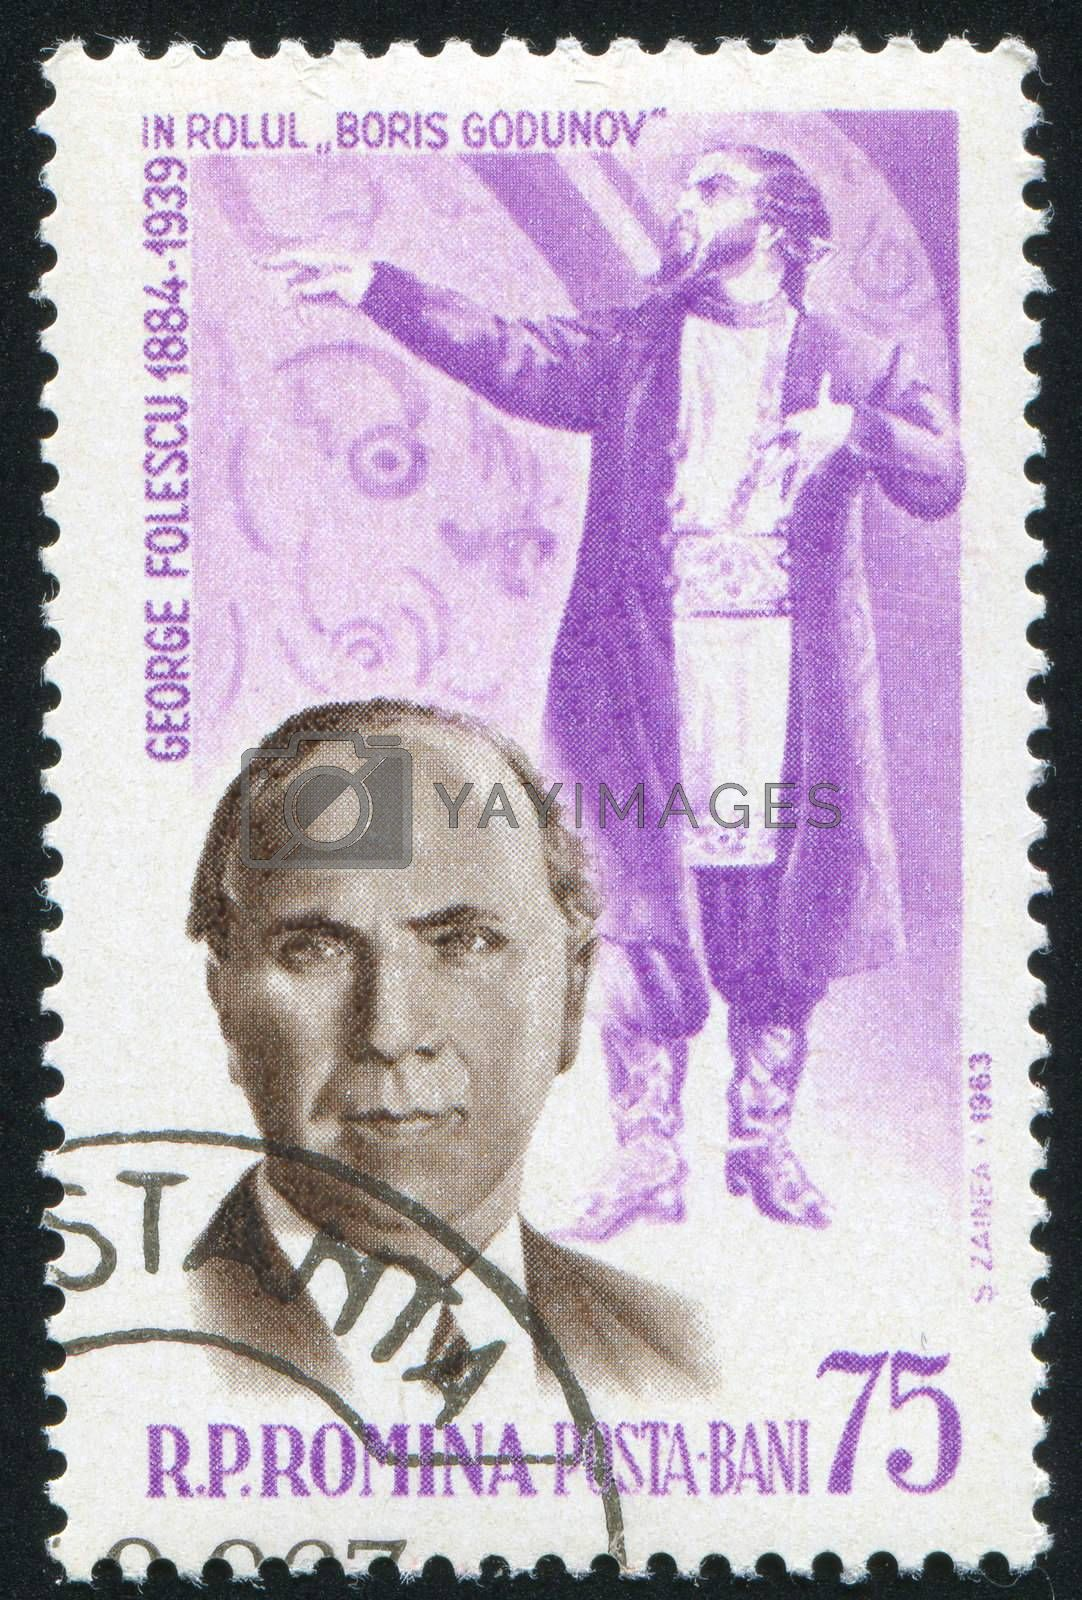 ROMANIA - CIRCA 1963: stamp printed by Romania, show George Folescu as Boris Godunov, circa 1963.